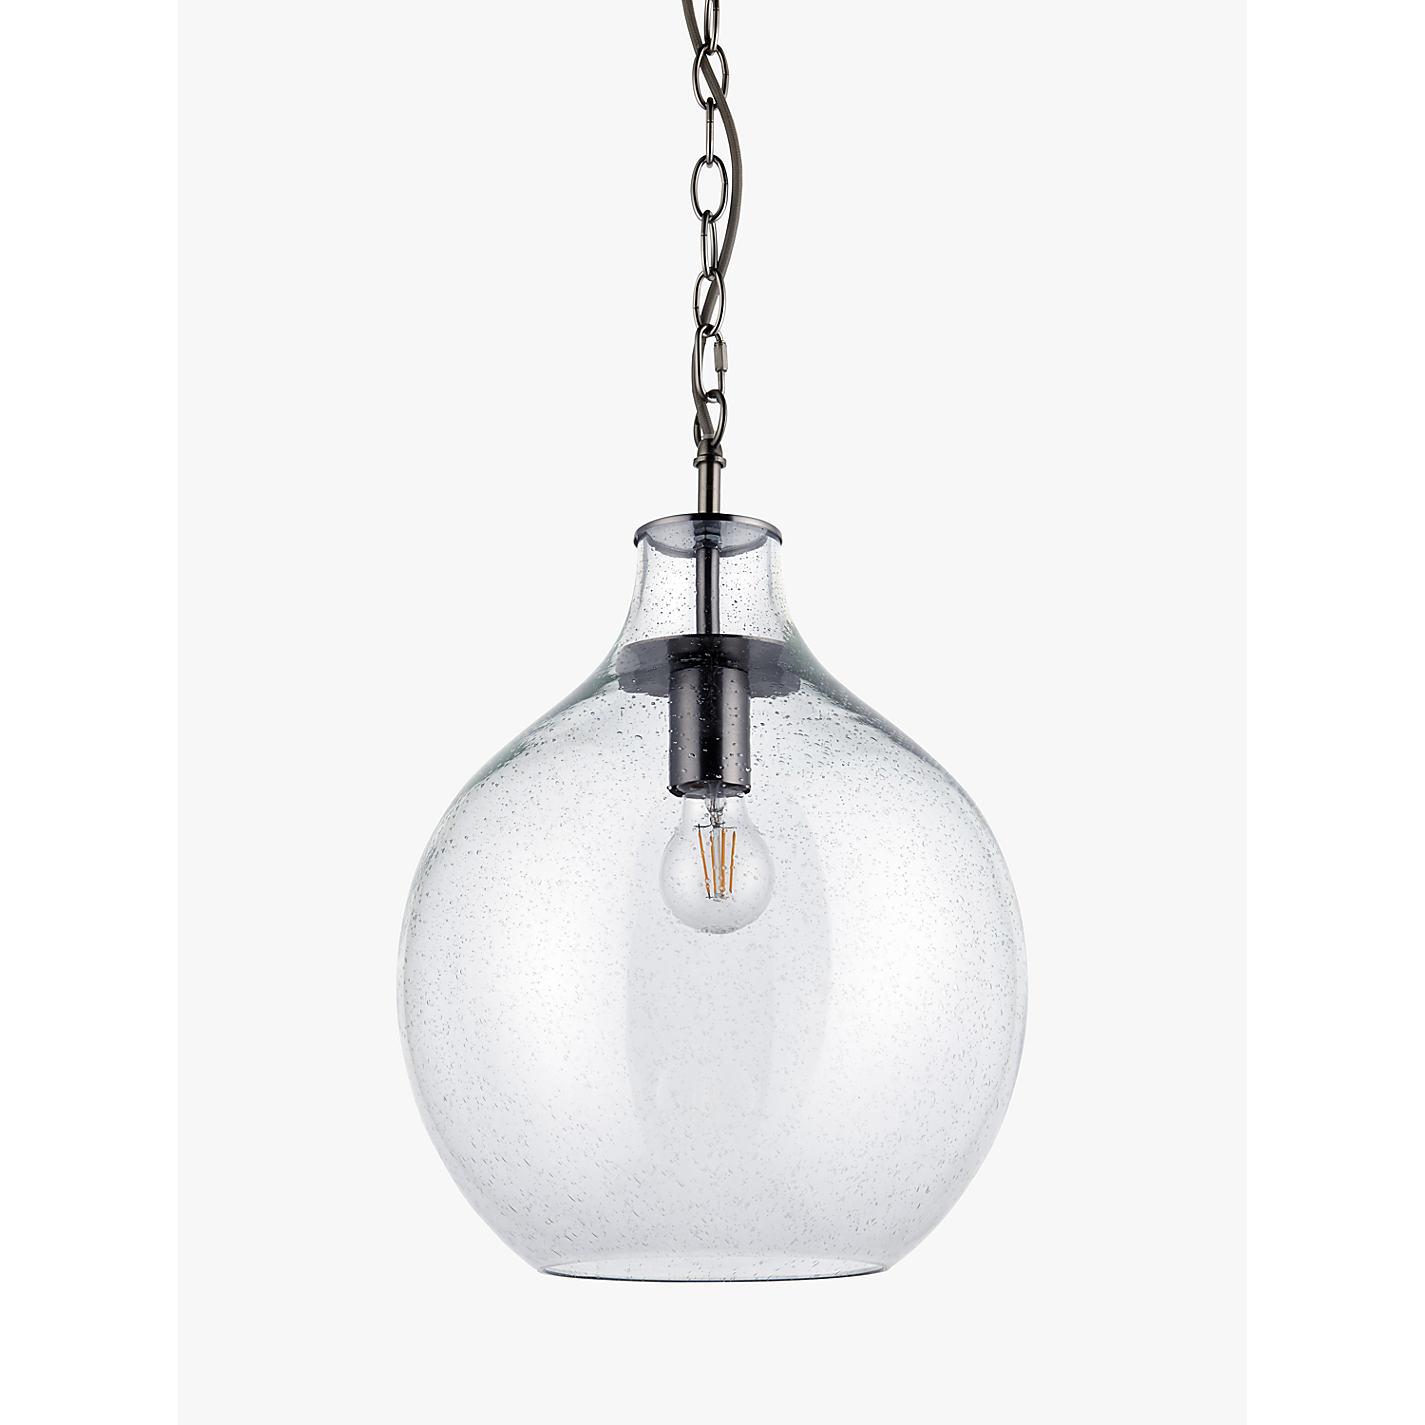 John lewis ceiling lamps energywarden john lewis ceiling pendant lights theteenline org mozeypictures Gallery